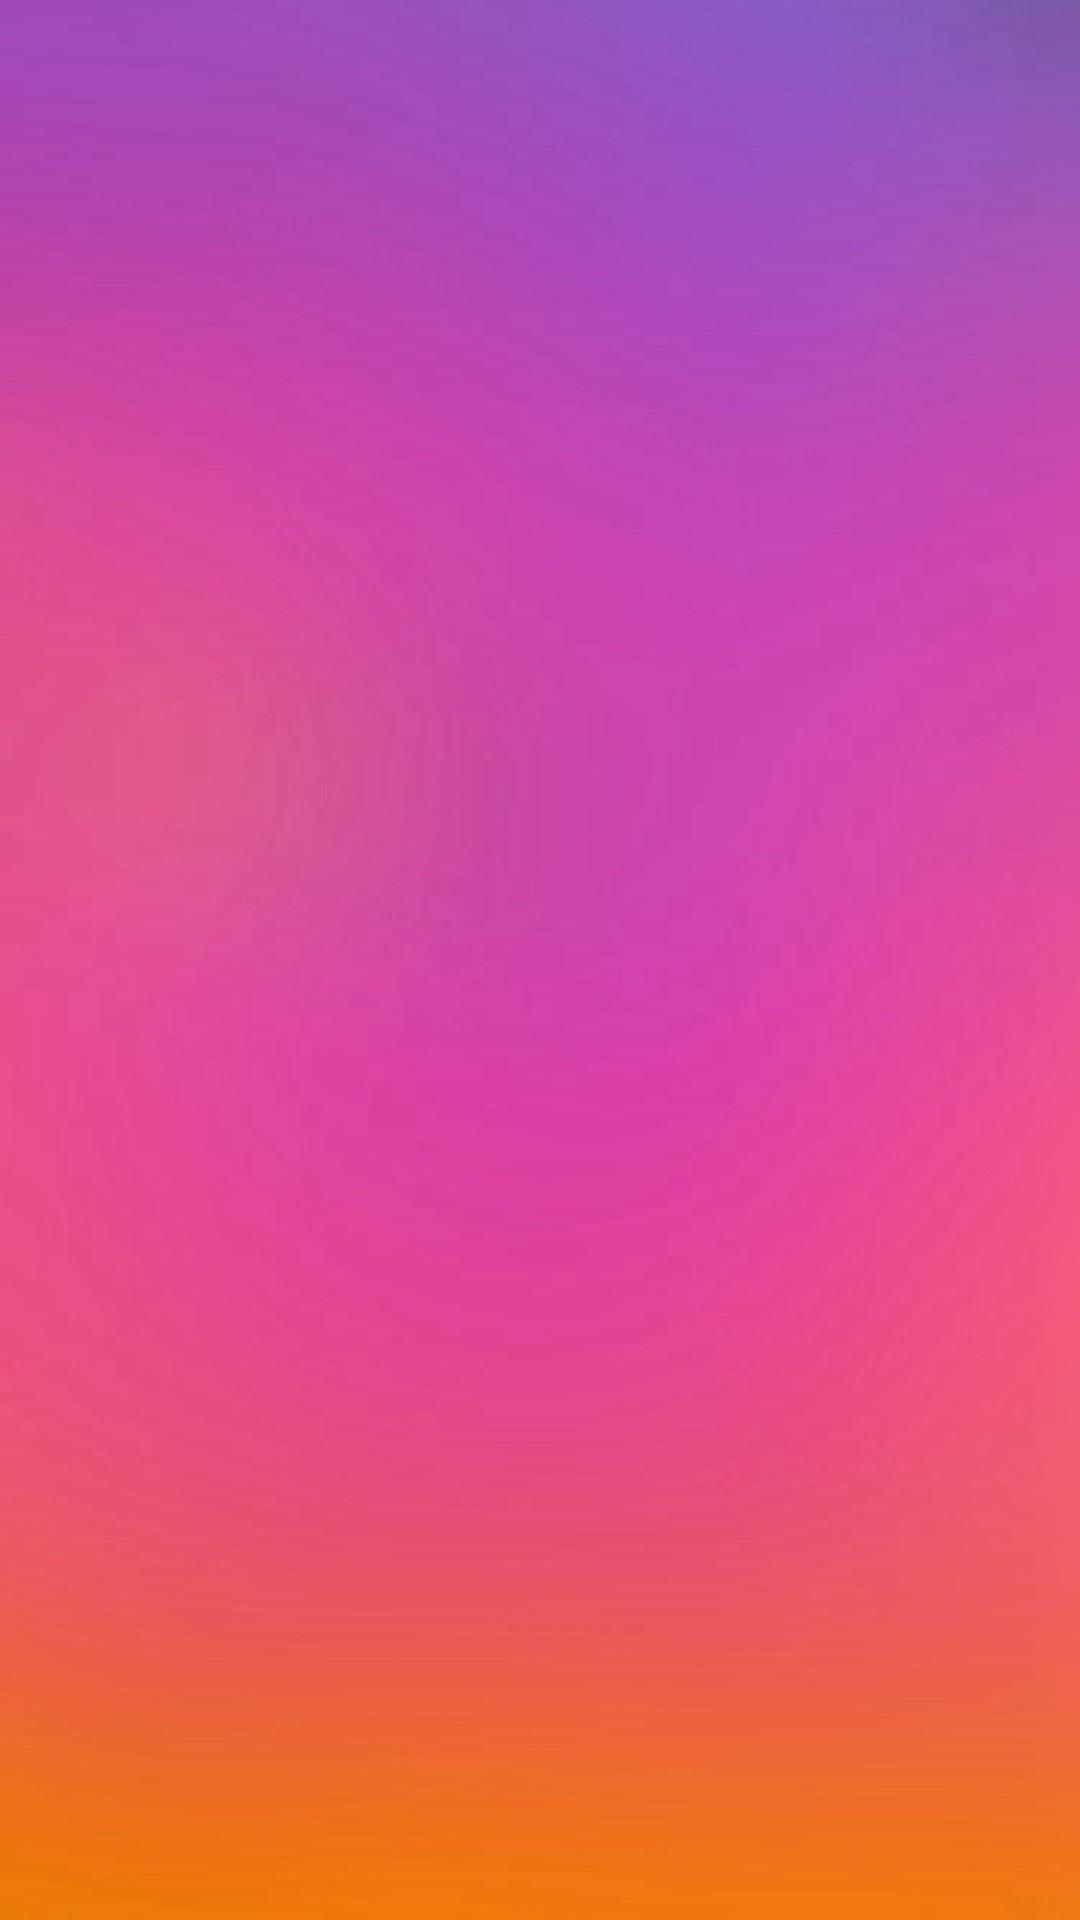 Hot Red Purple Sun Blur Gradation iPhone 6 wallpaper